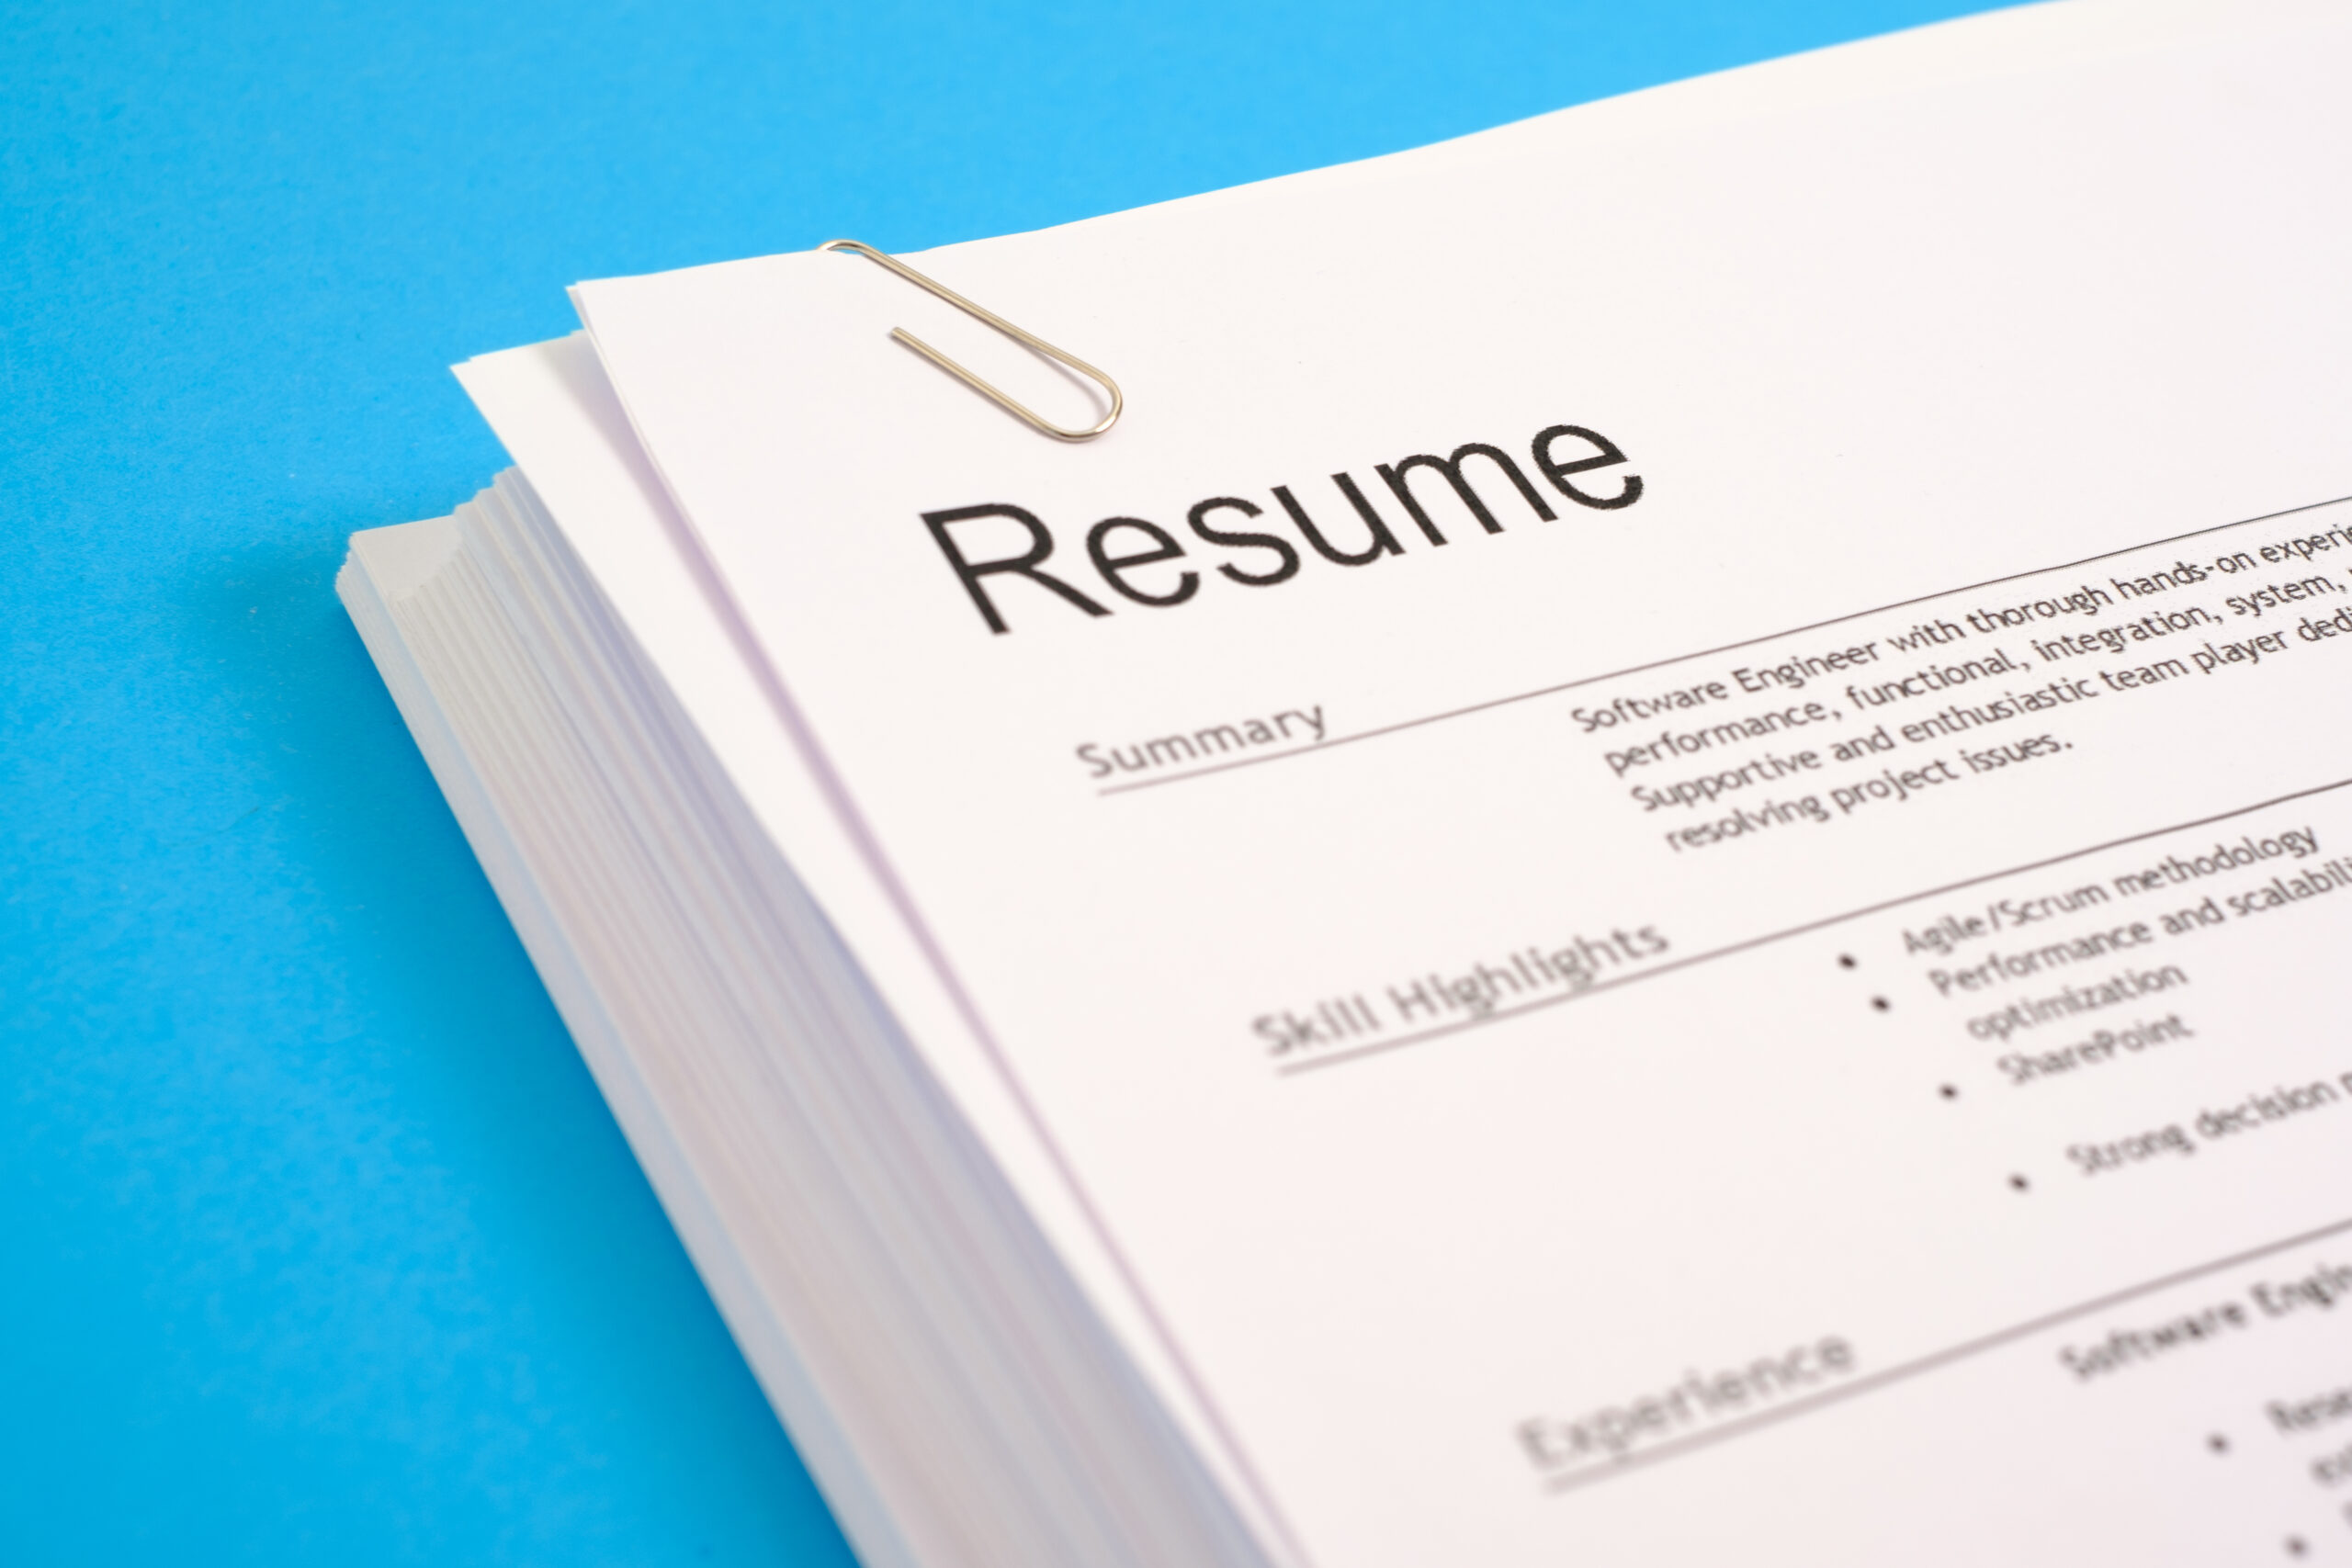 SC Works offers job seekers virtual employment skills workshops in December